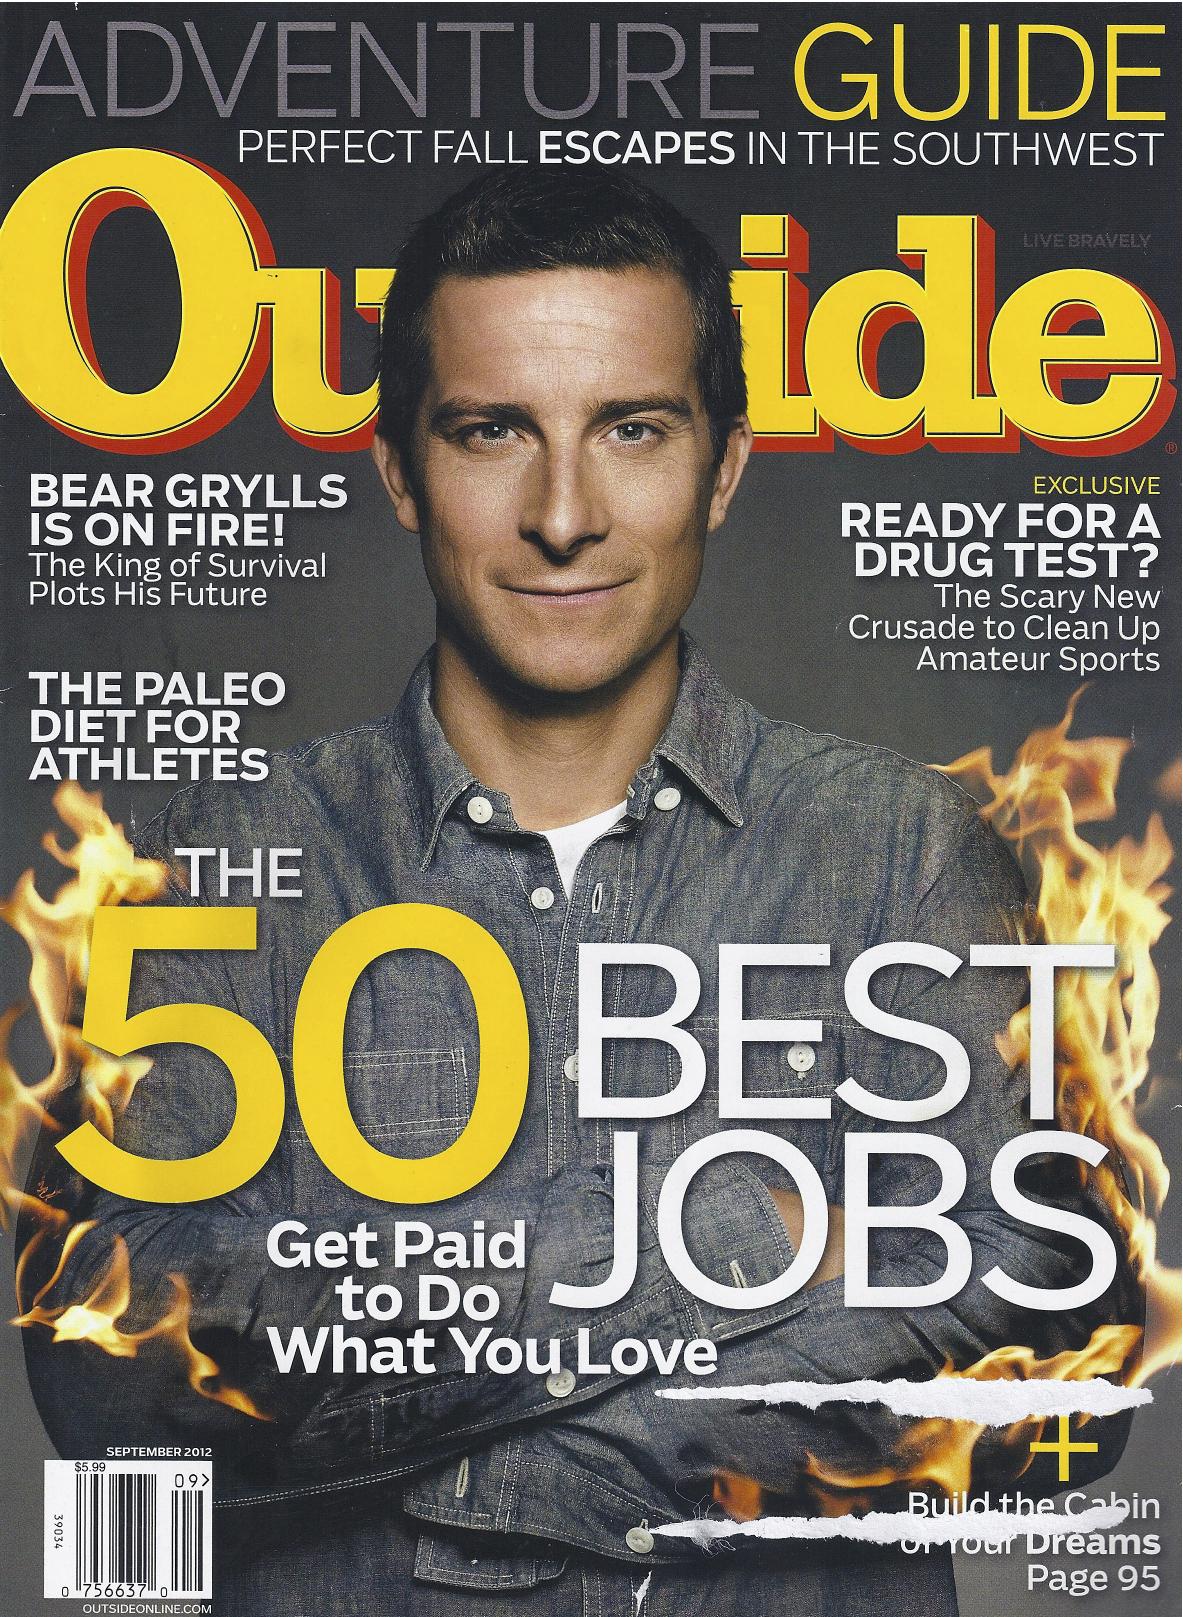 Image: Outside Magazine cover